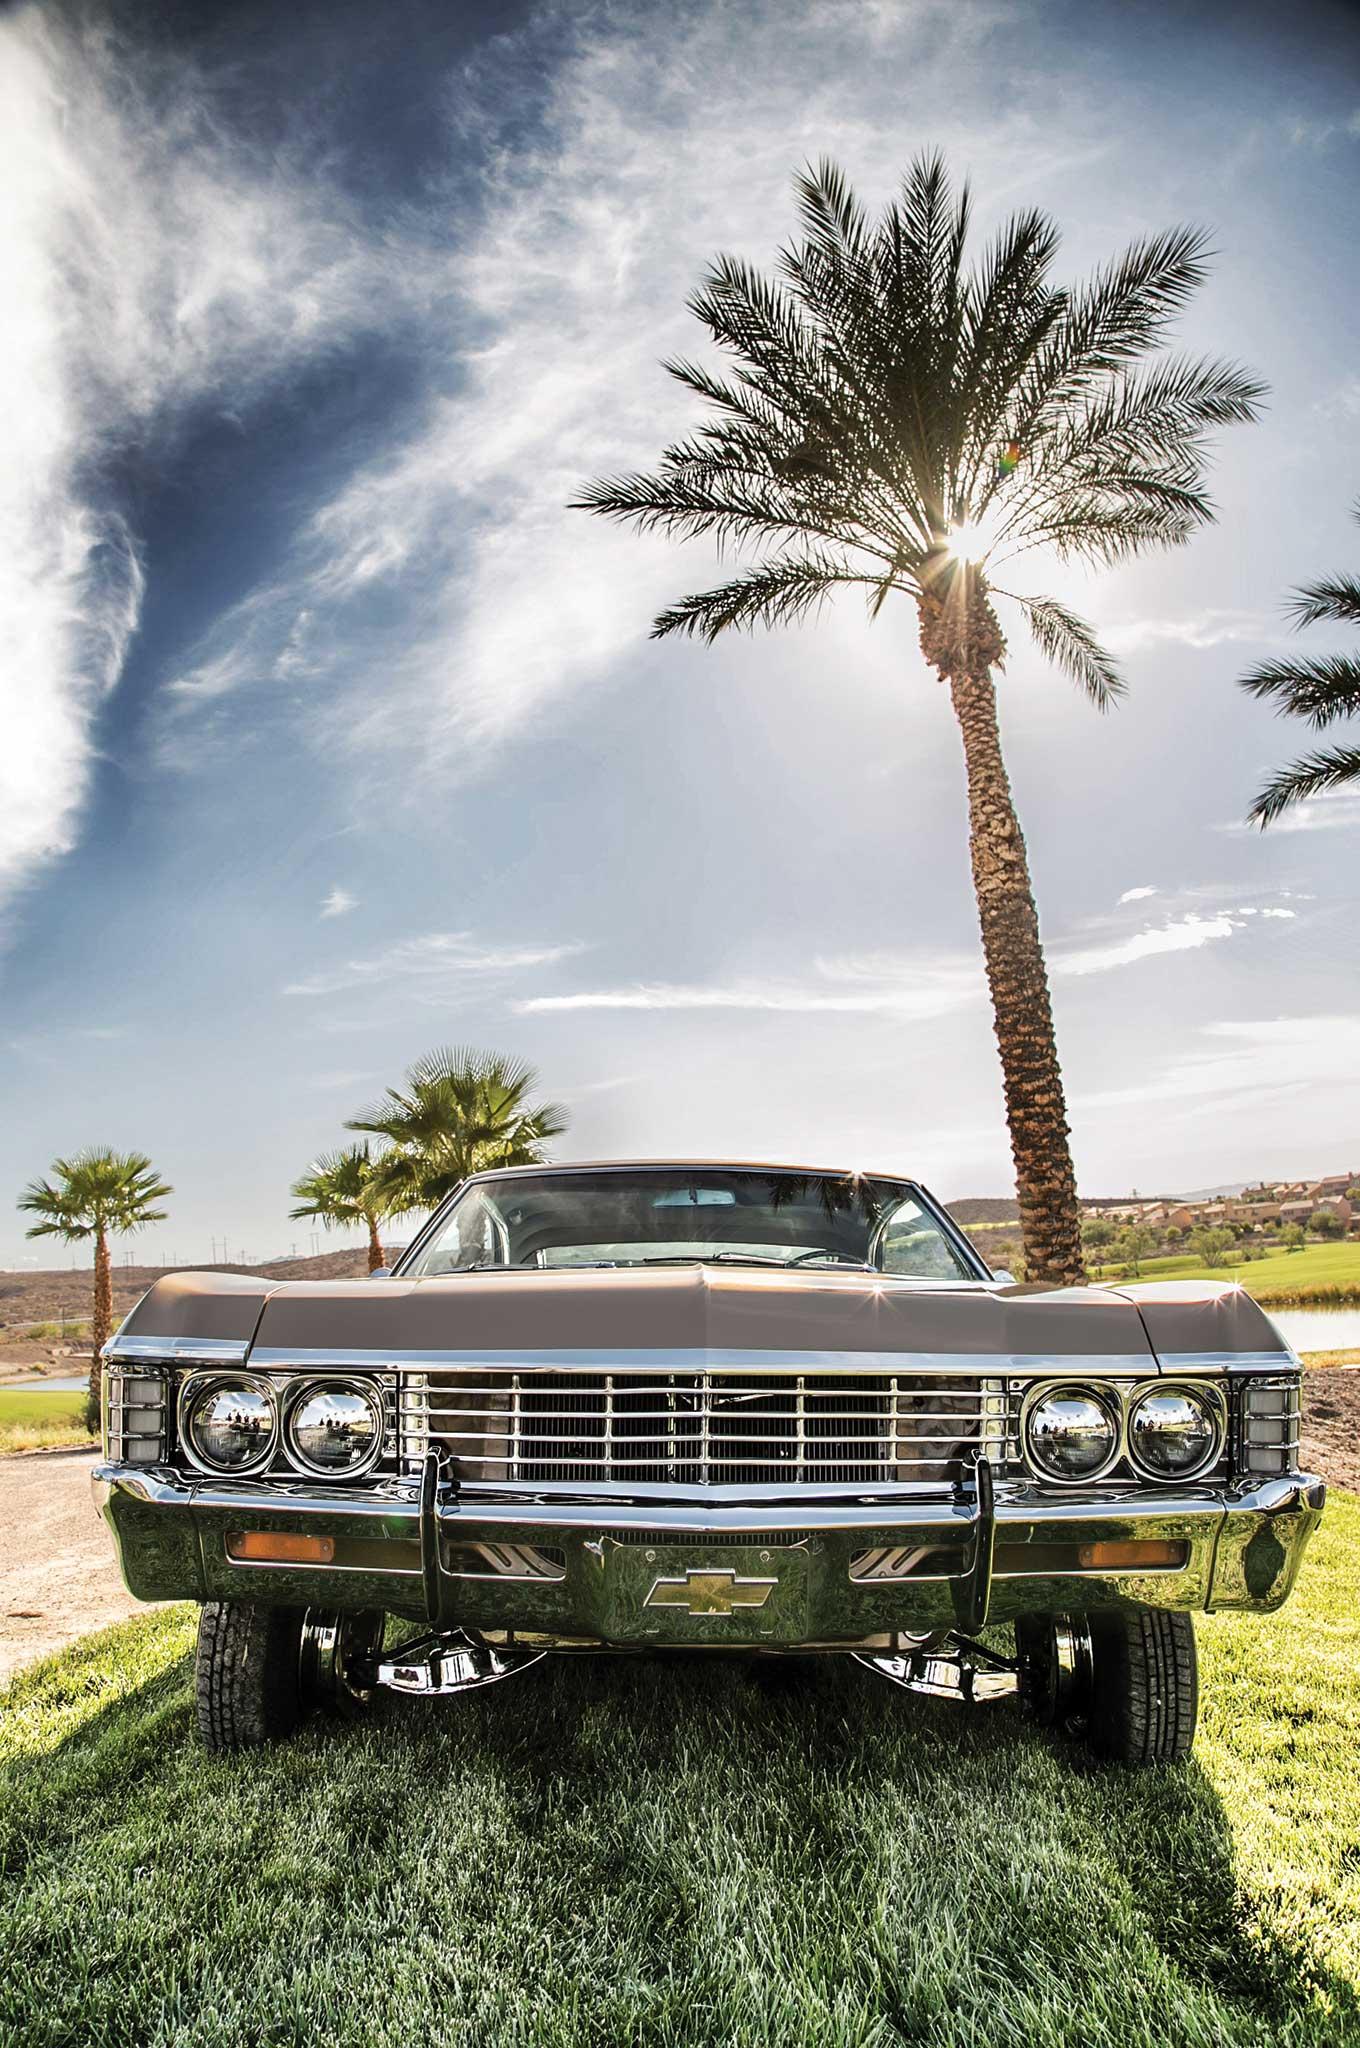 1967 Chevrolet Impala Cesars Palace Lowrider